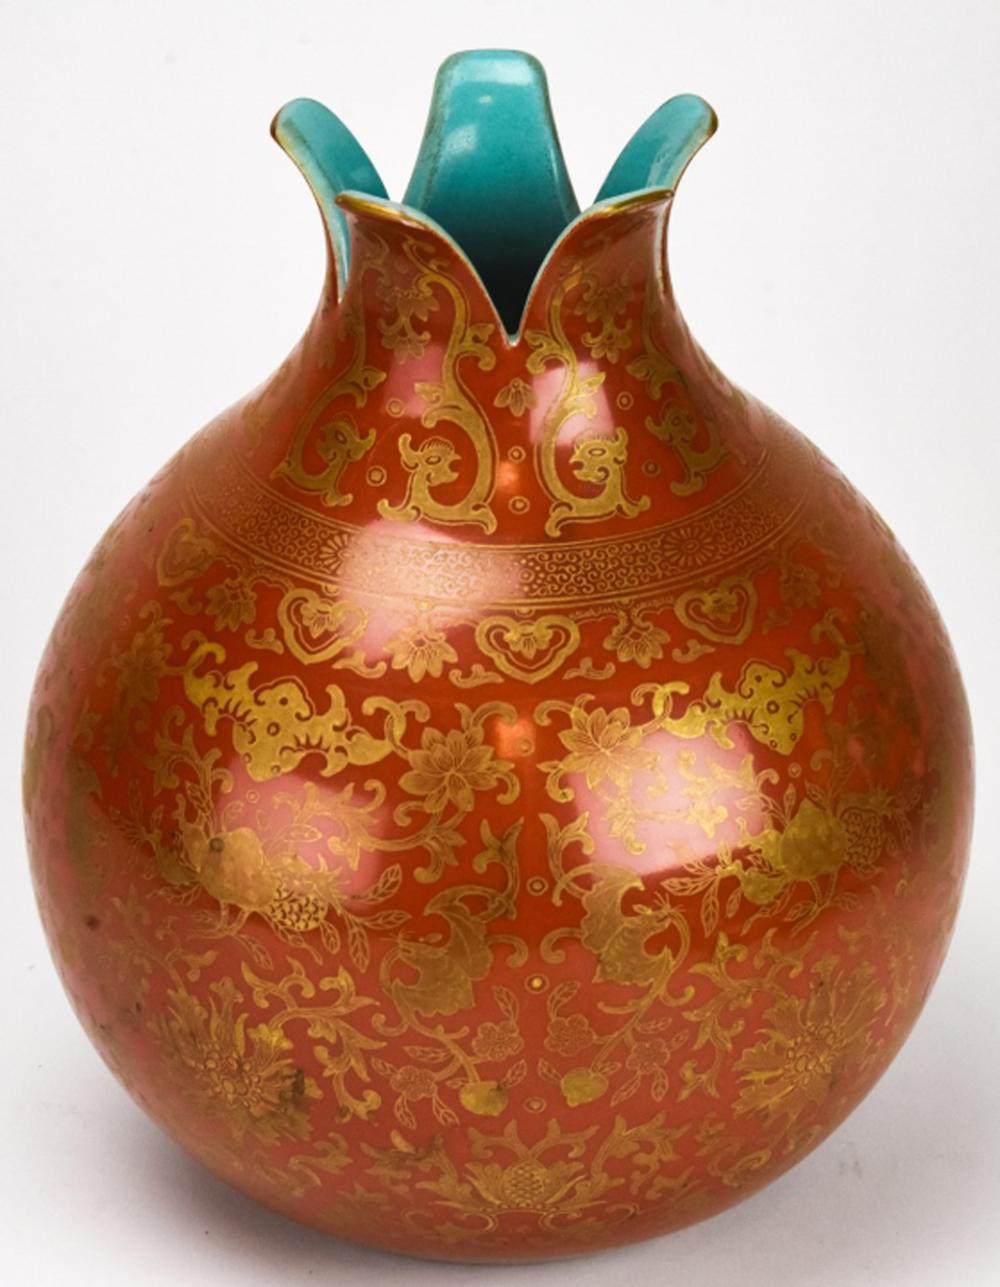 Chinese Porcelain Pomegranate Form Vase